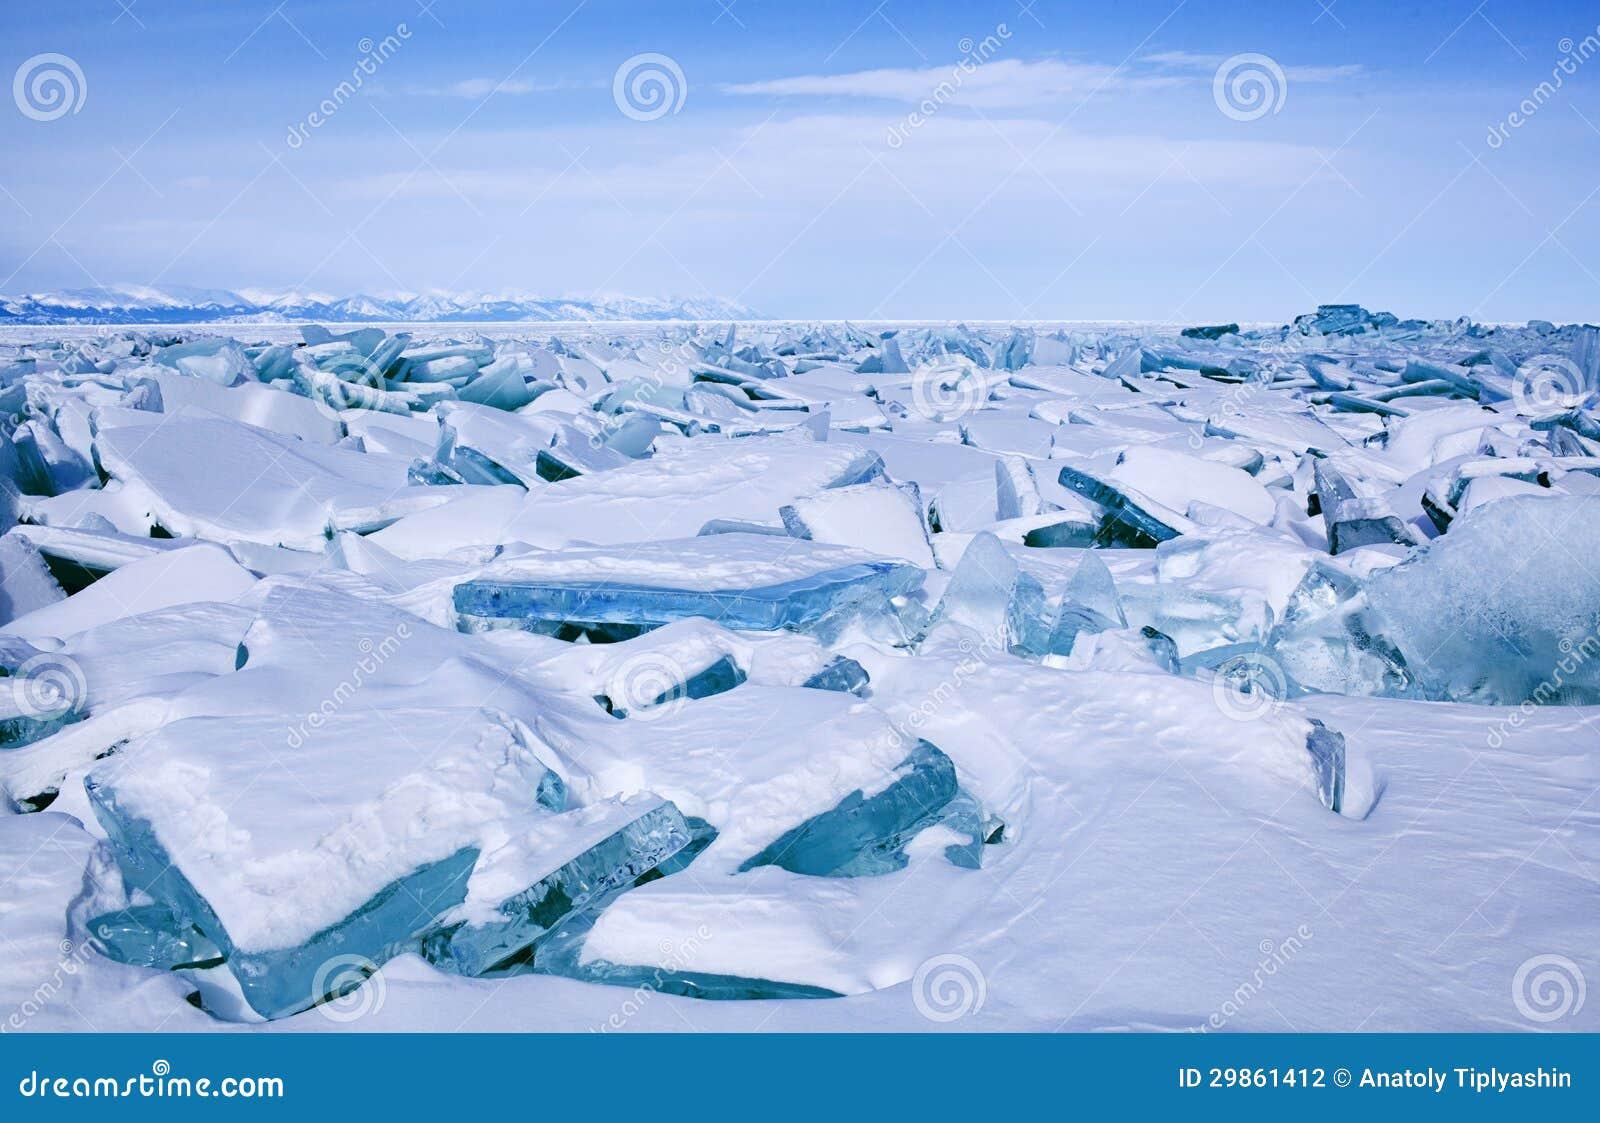 North - Siberia